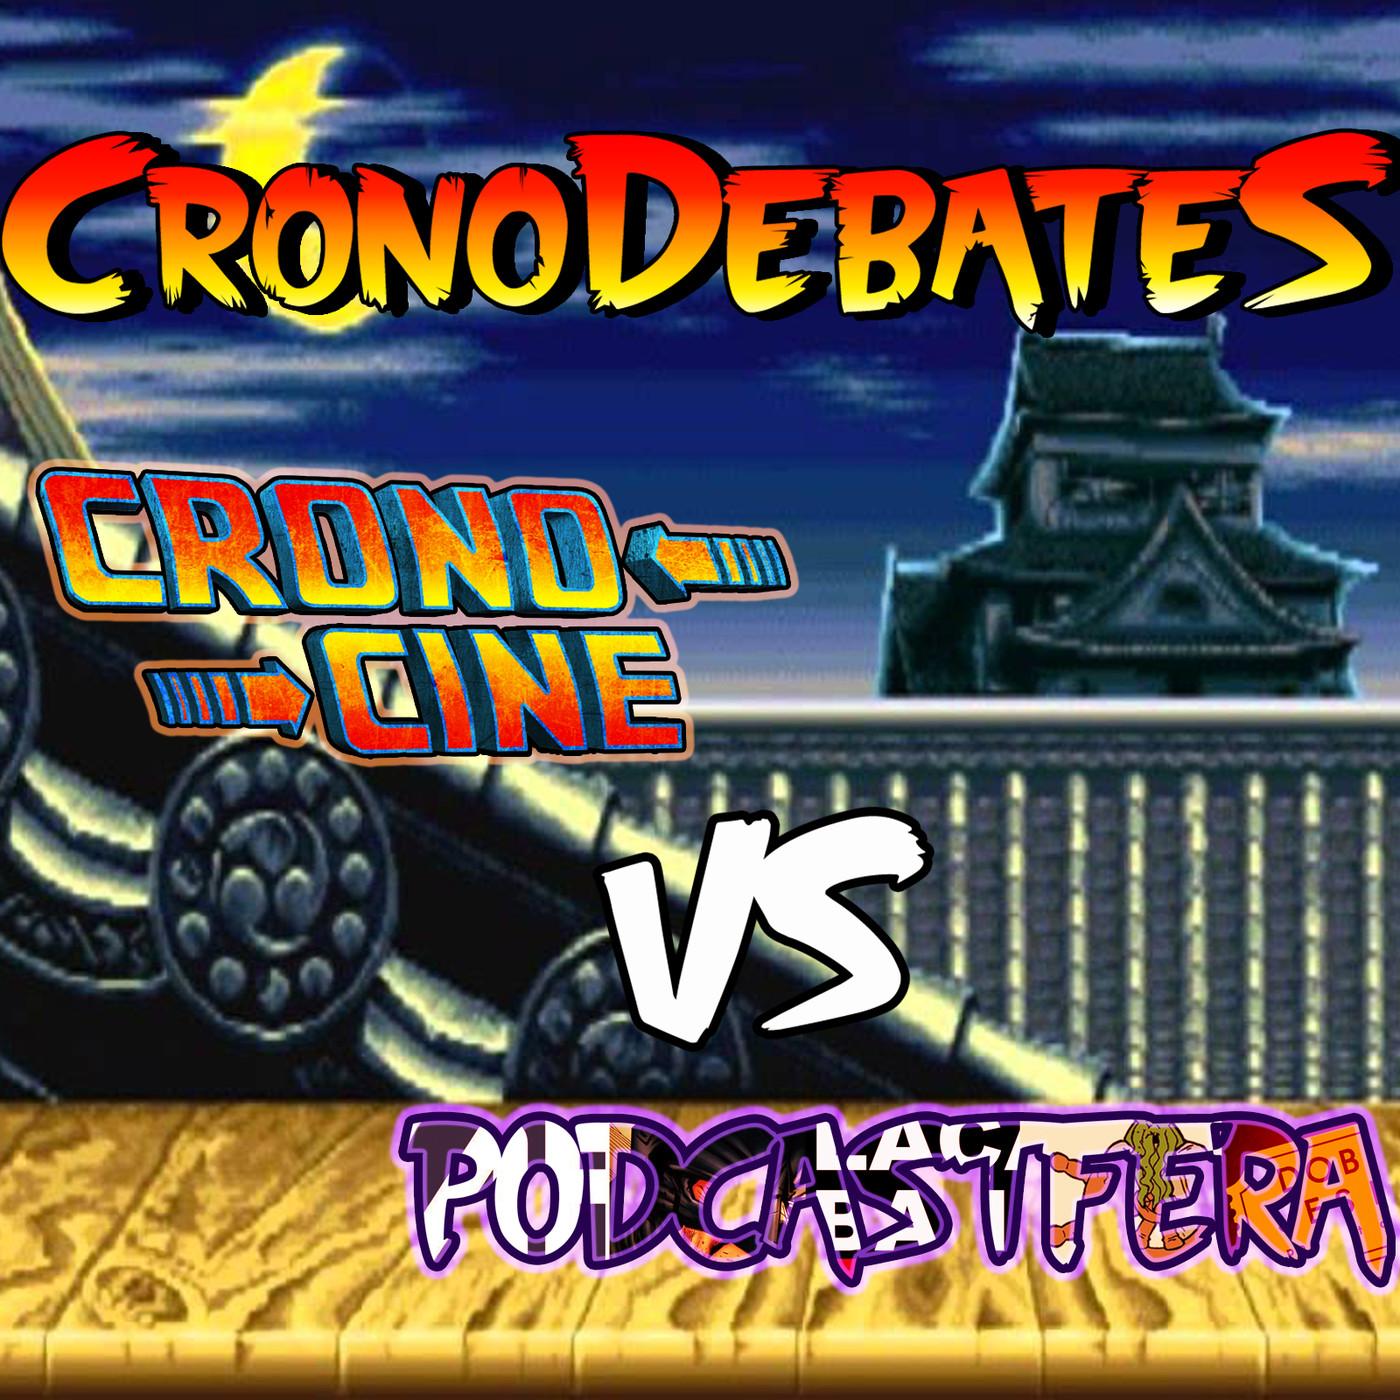 CronoDebates: CronoCine vs Podcastfera (@ApocalipsisFrik, @pr17comic, @lacabanapodcast, @CDNantucket y @doblesesionpdc)